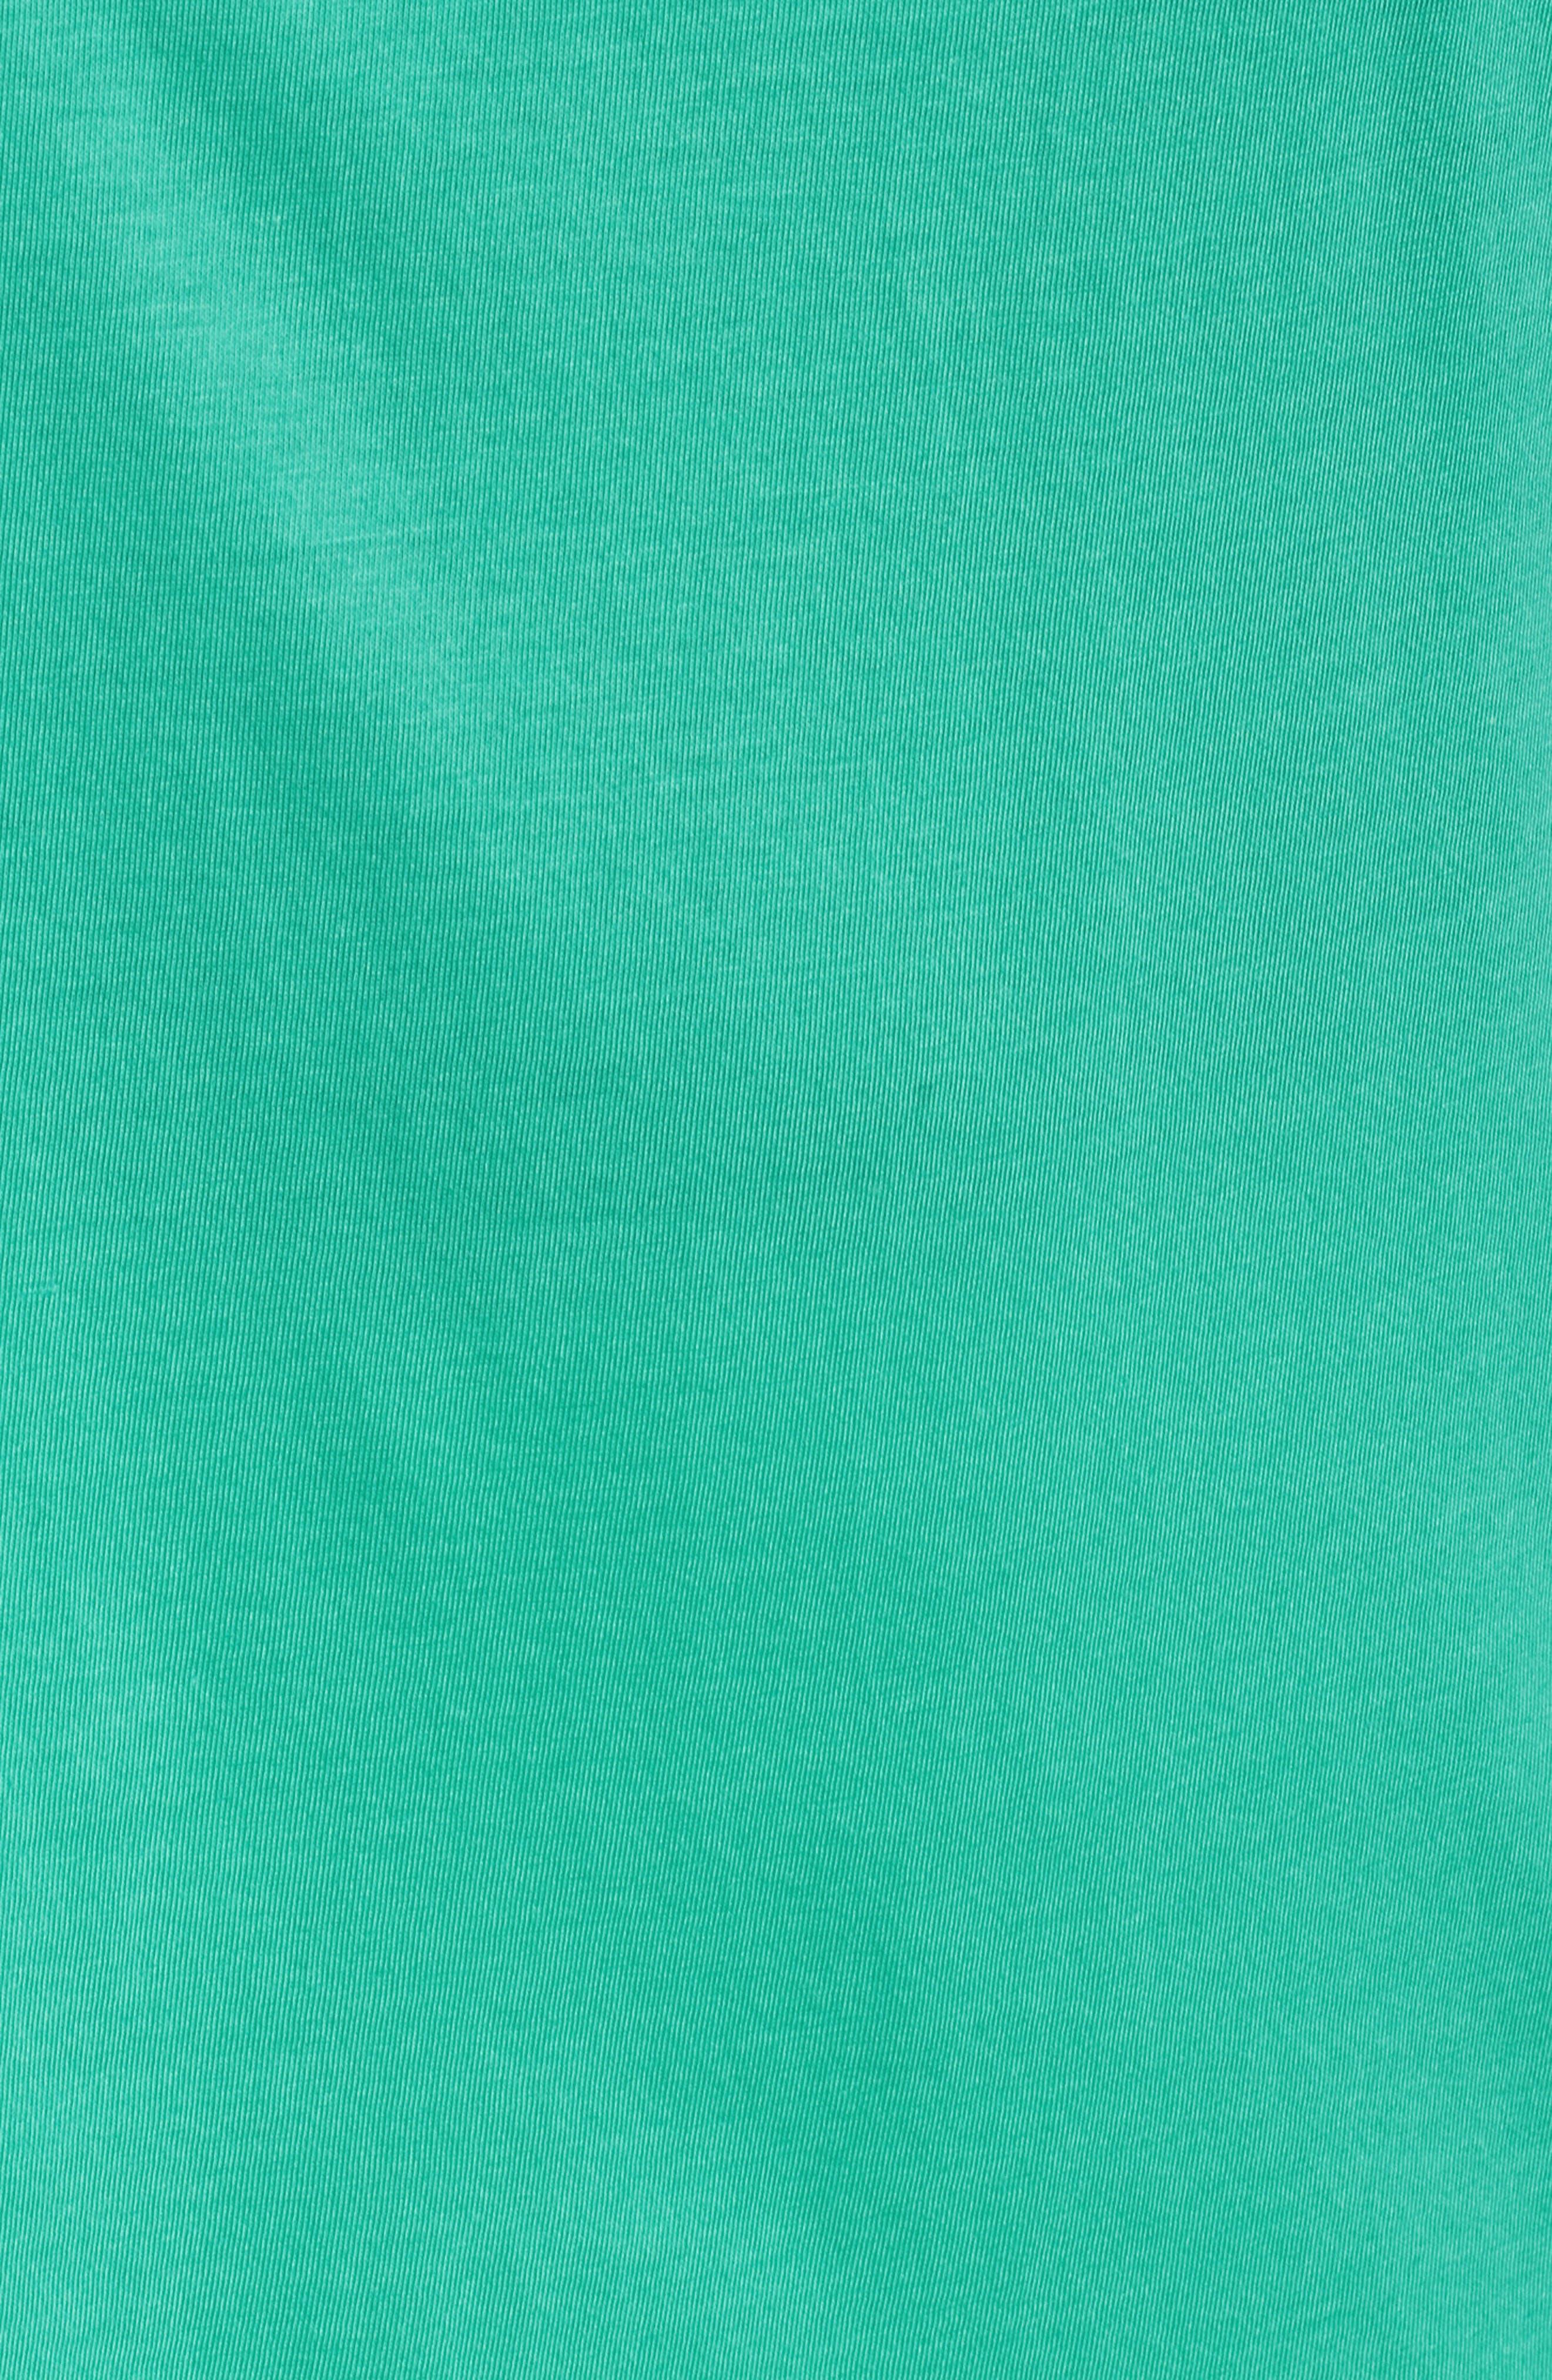 Ruffle Sleeve Top,                             Alternate thumbnail 6, color,                             AQUA